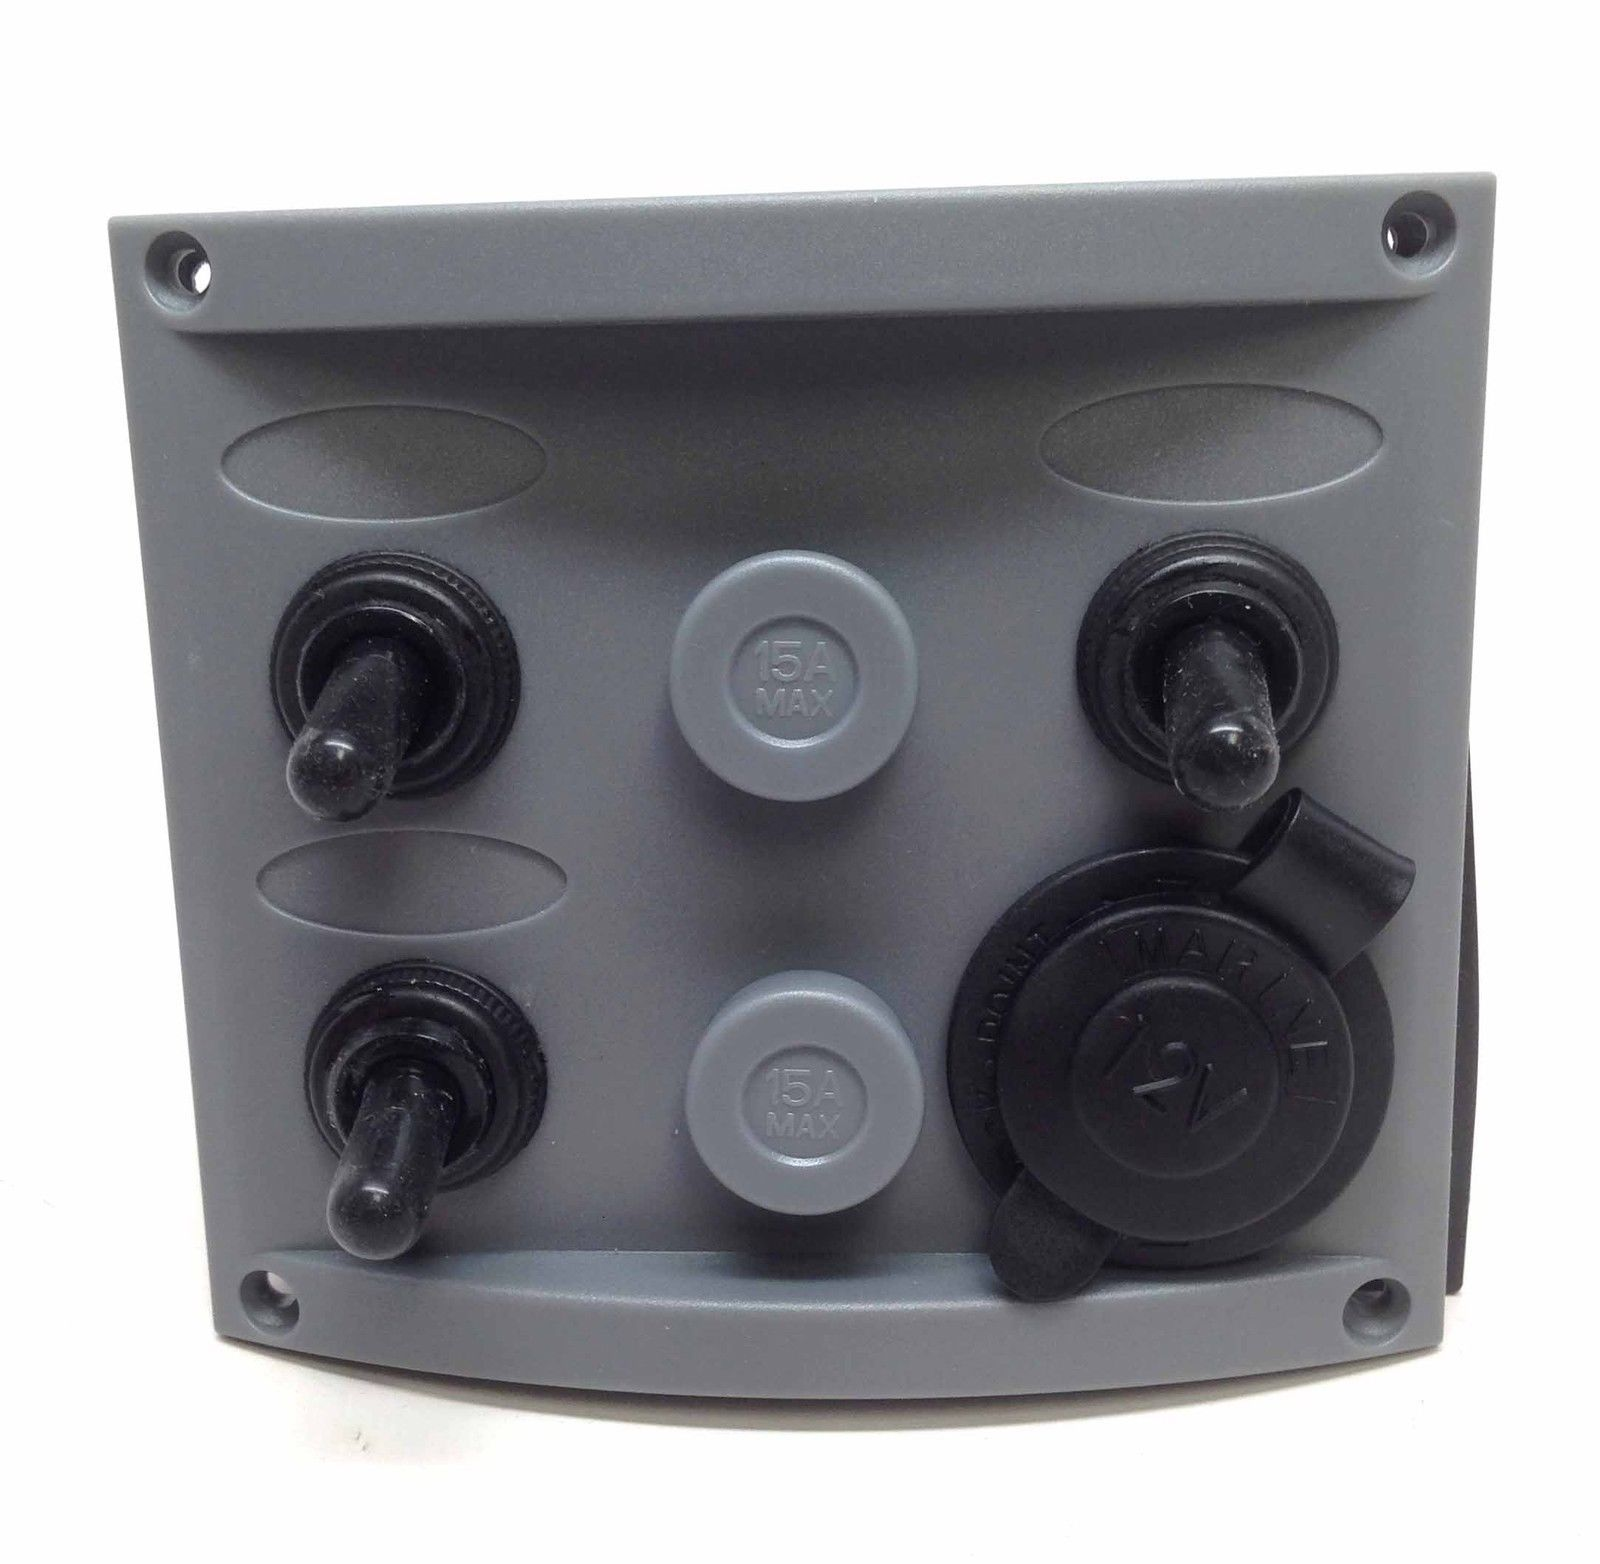 Marine Boat Grey Switch Panel Cigarette Plug 1 Momentary